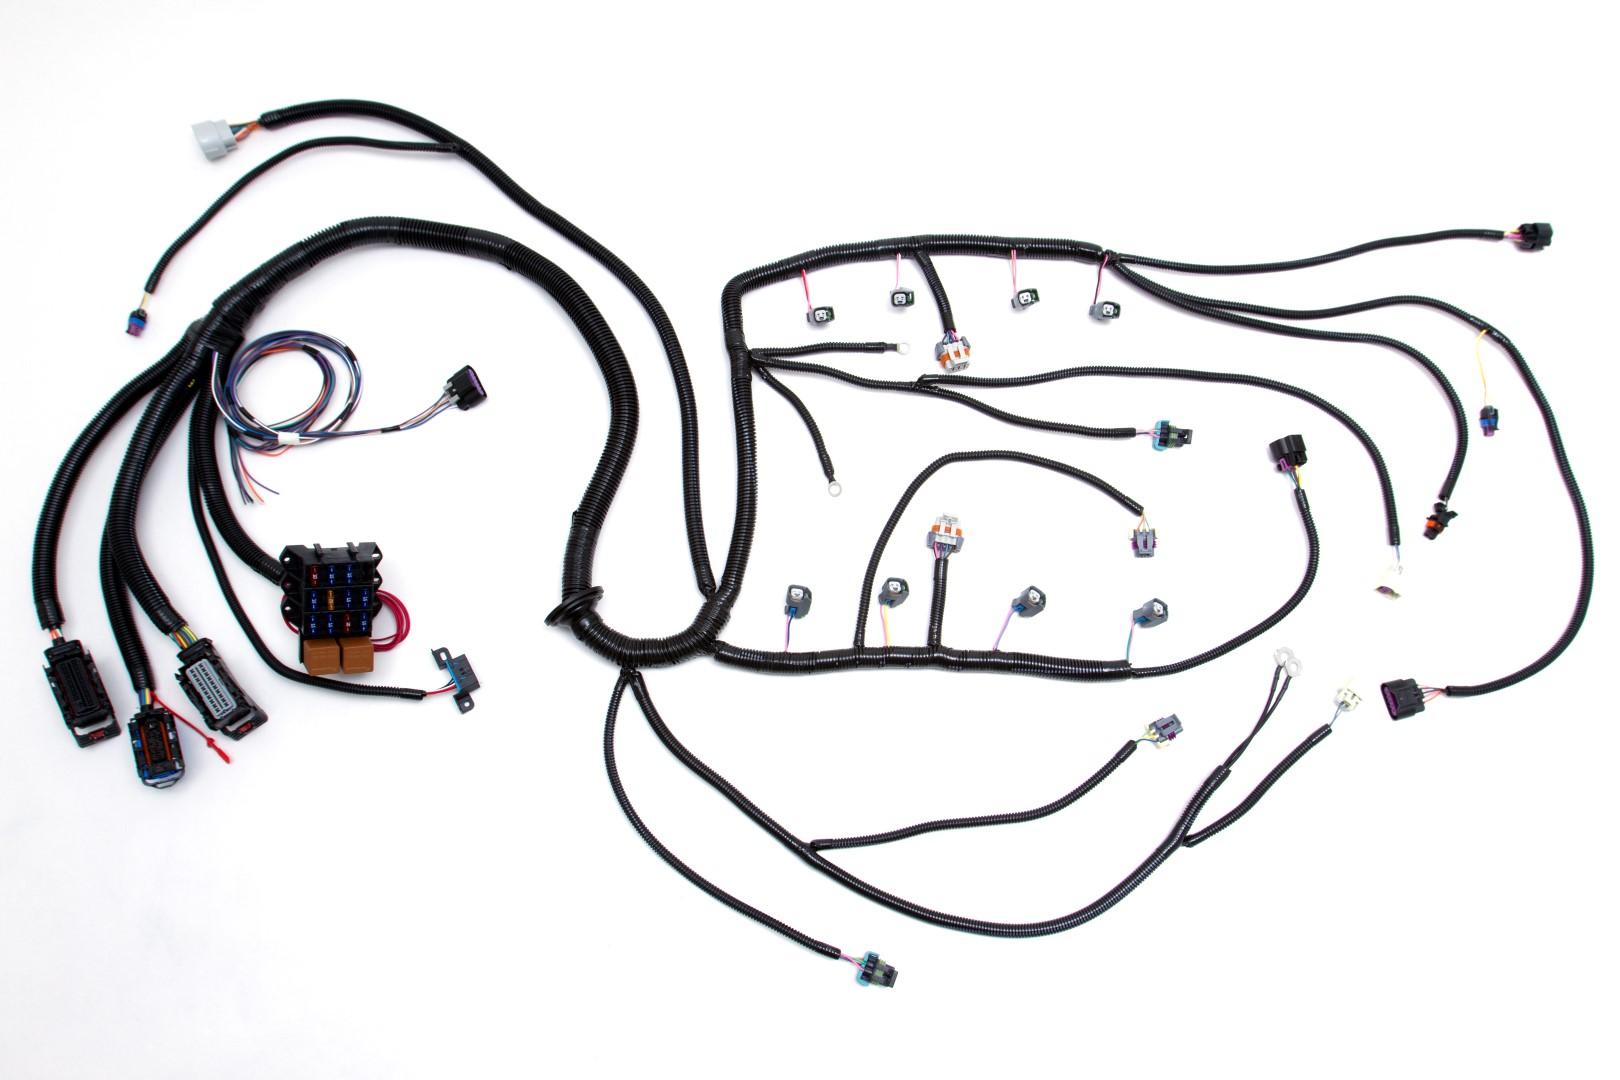 u0026 39 08 -  u0026 39 13 ls3  6 2l  standalone wiring harness w  4l60e